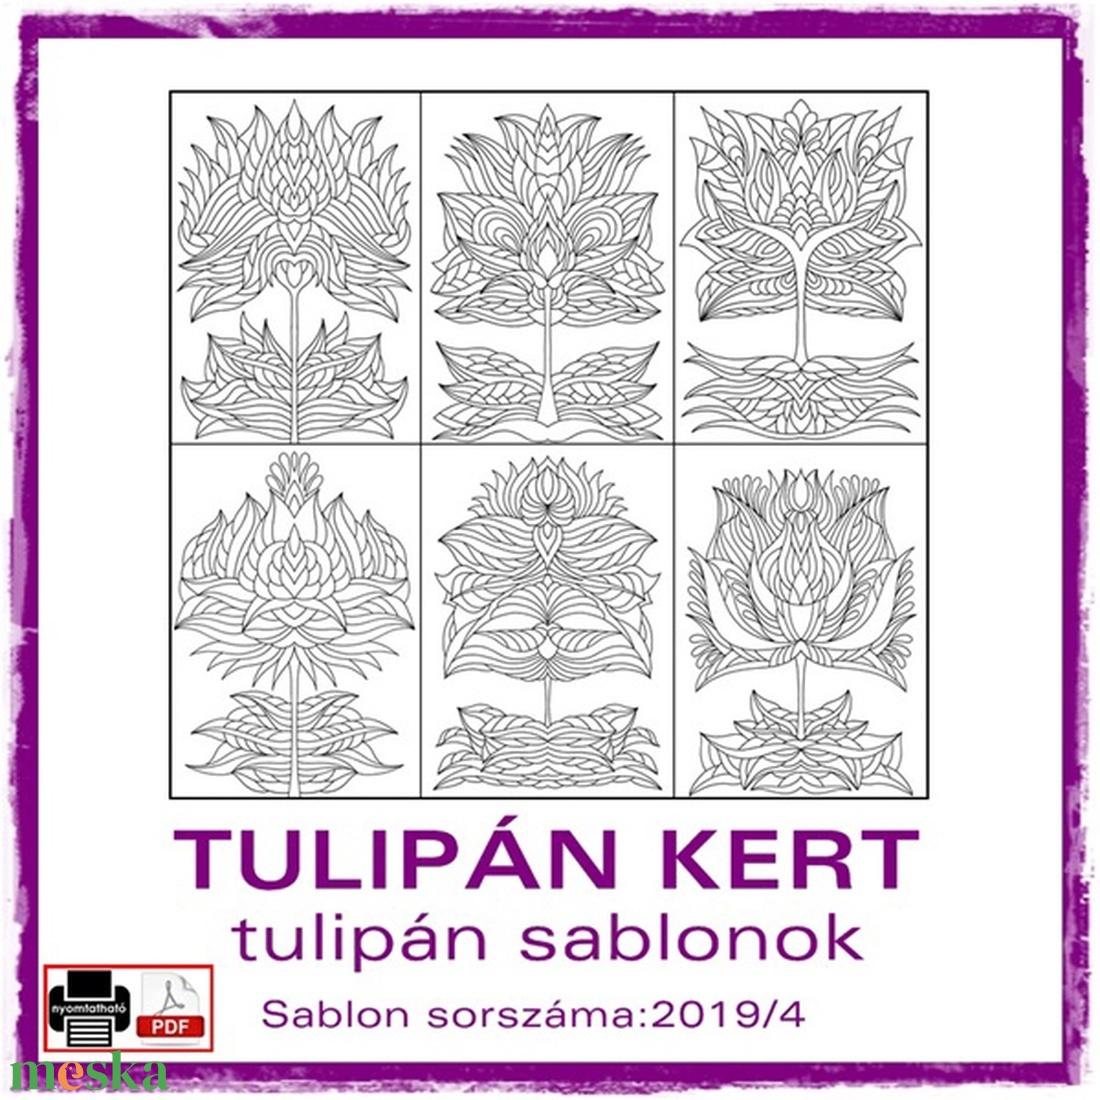 TulipánKert 2019/4 (kedo) - Meska.hu